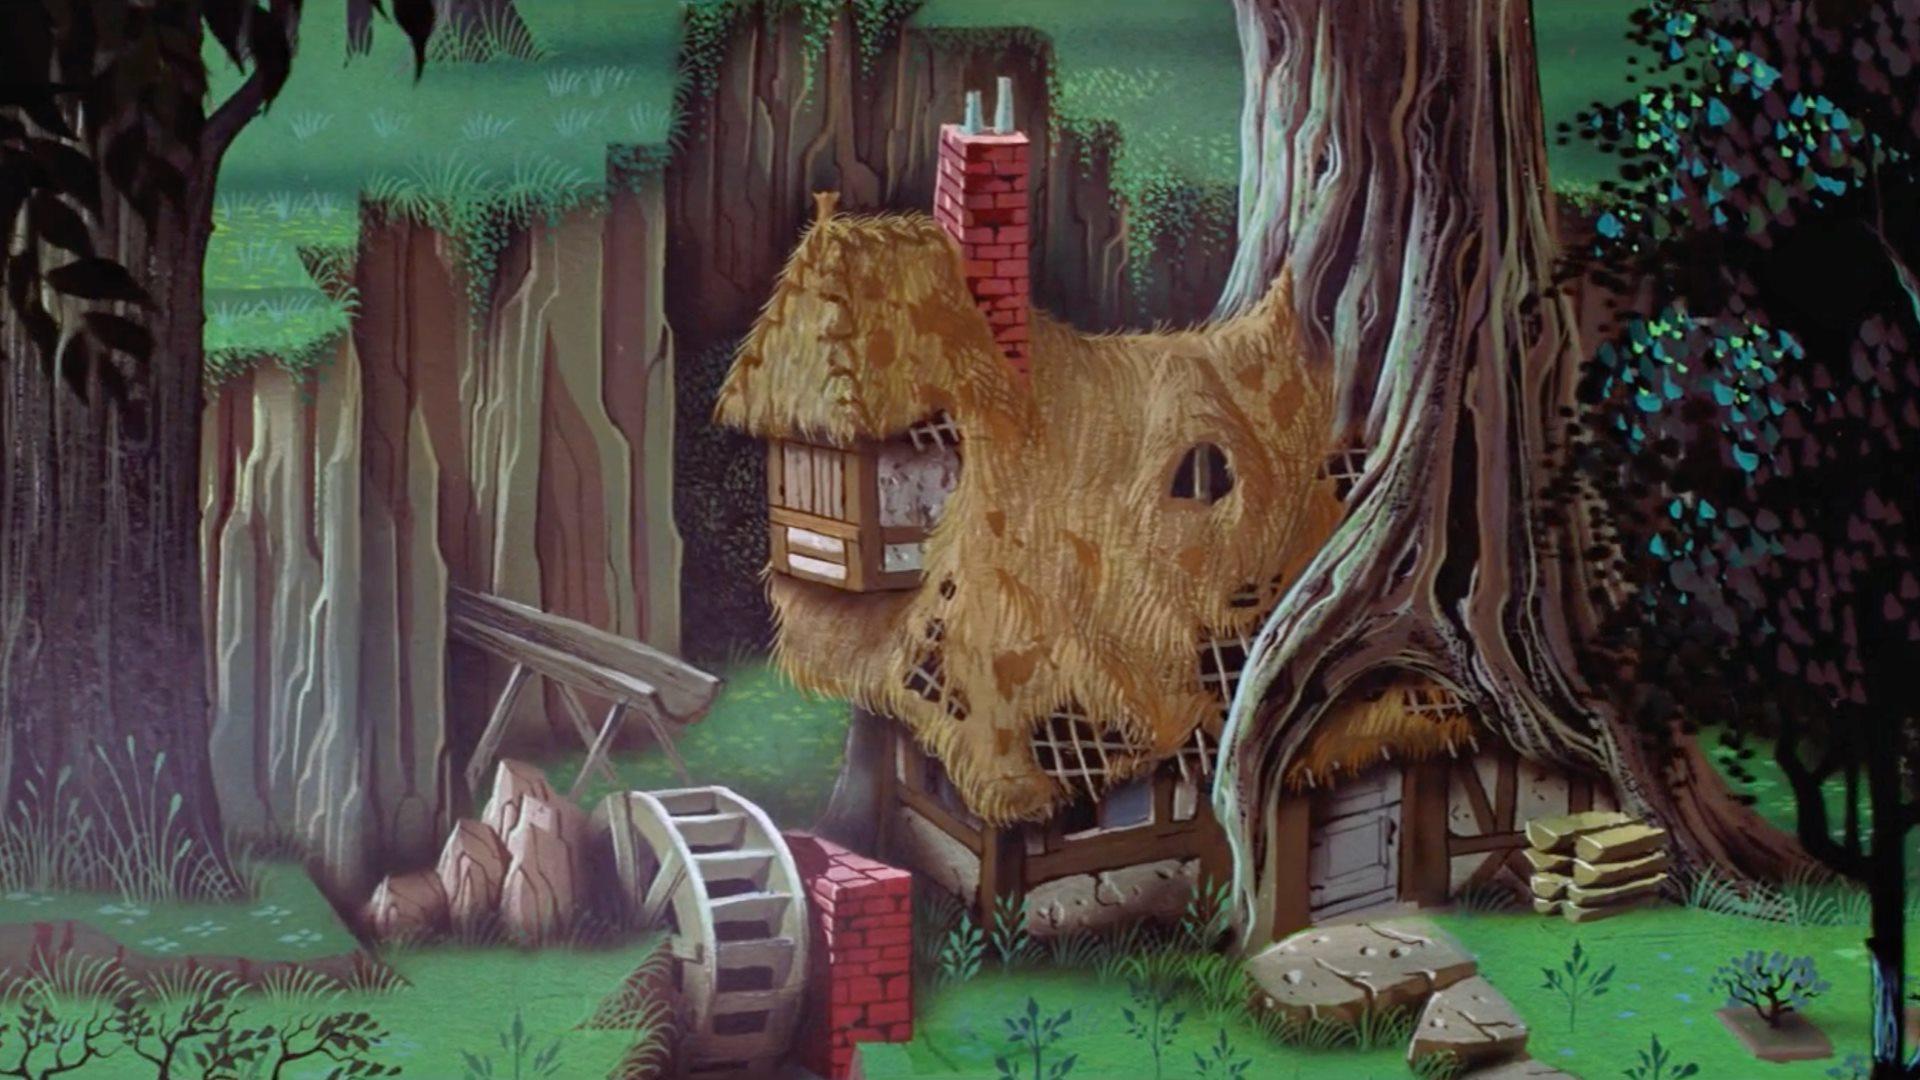 sleeping beauty's cottage